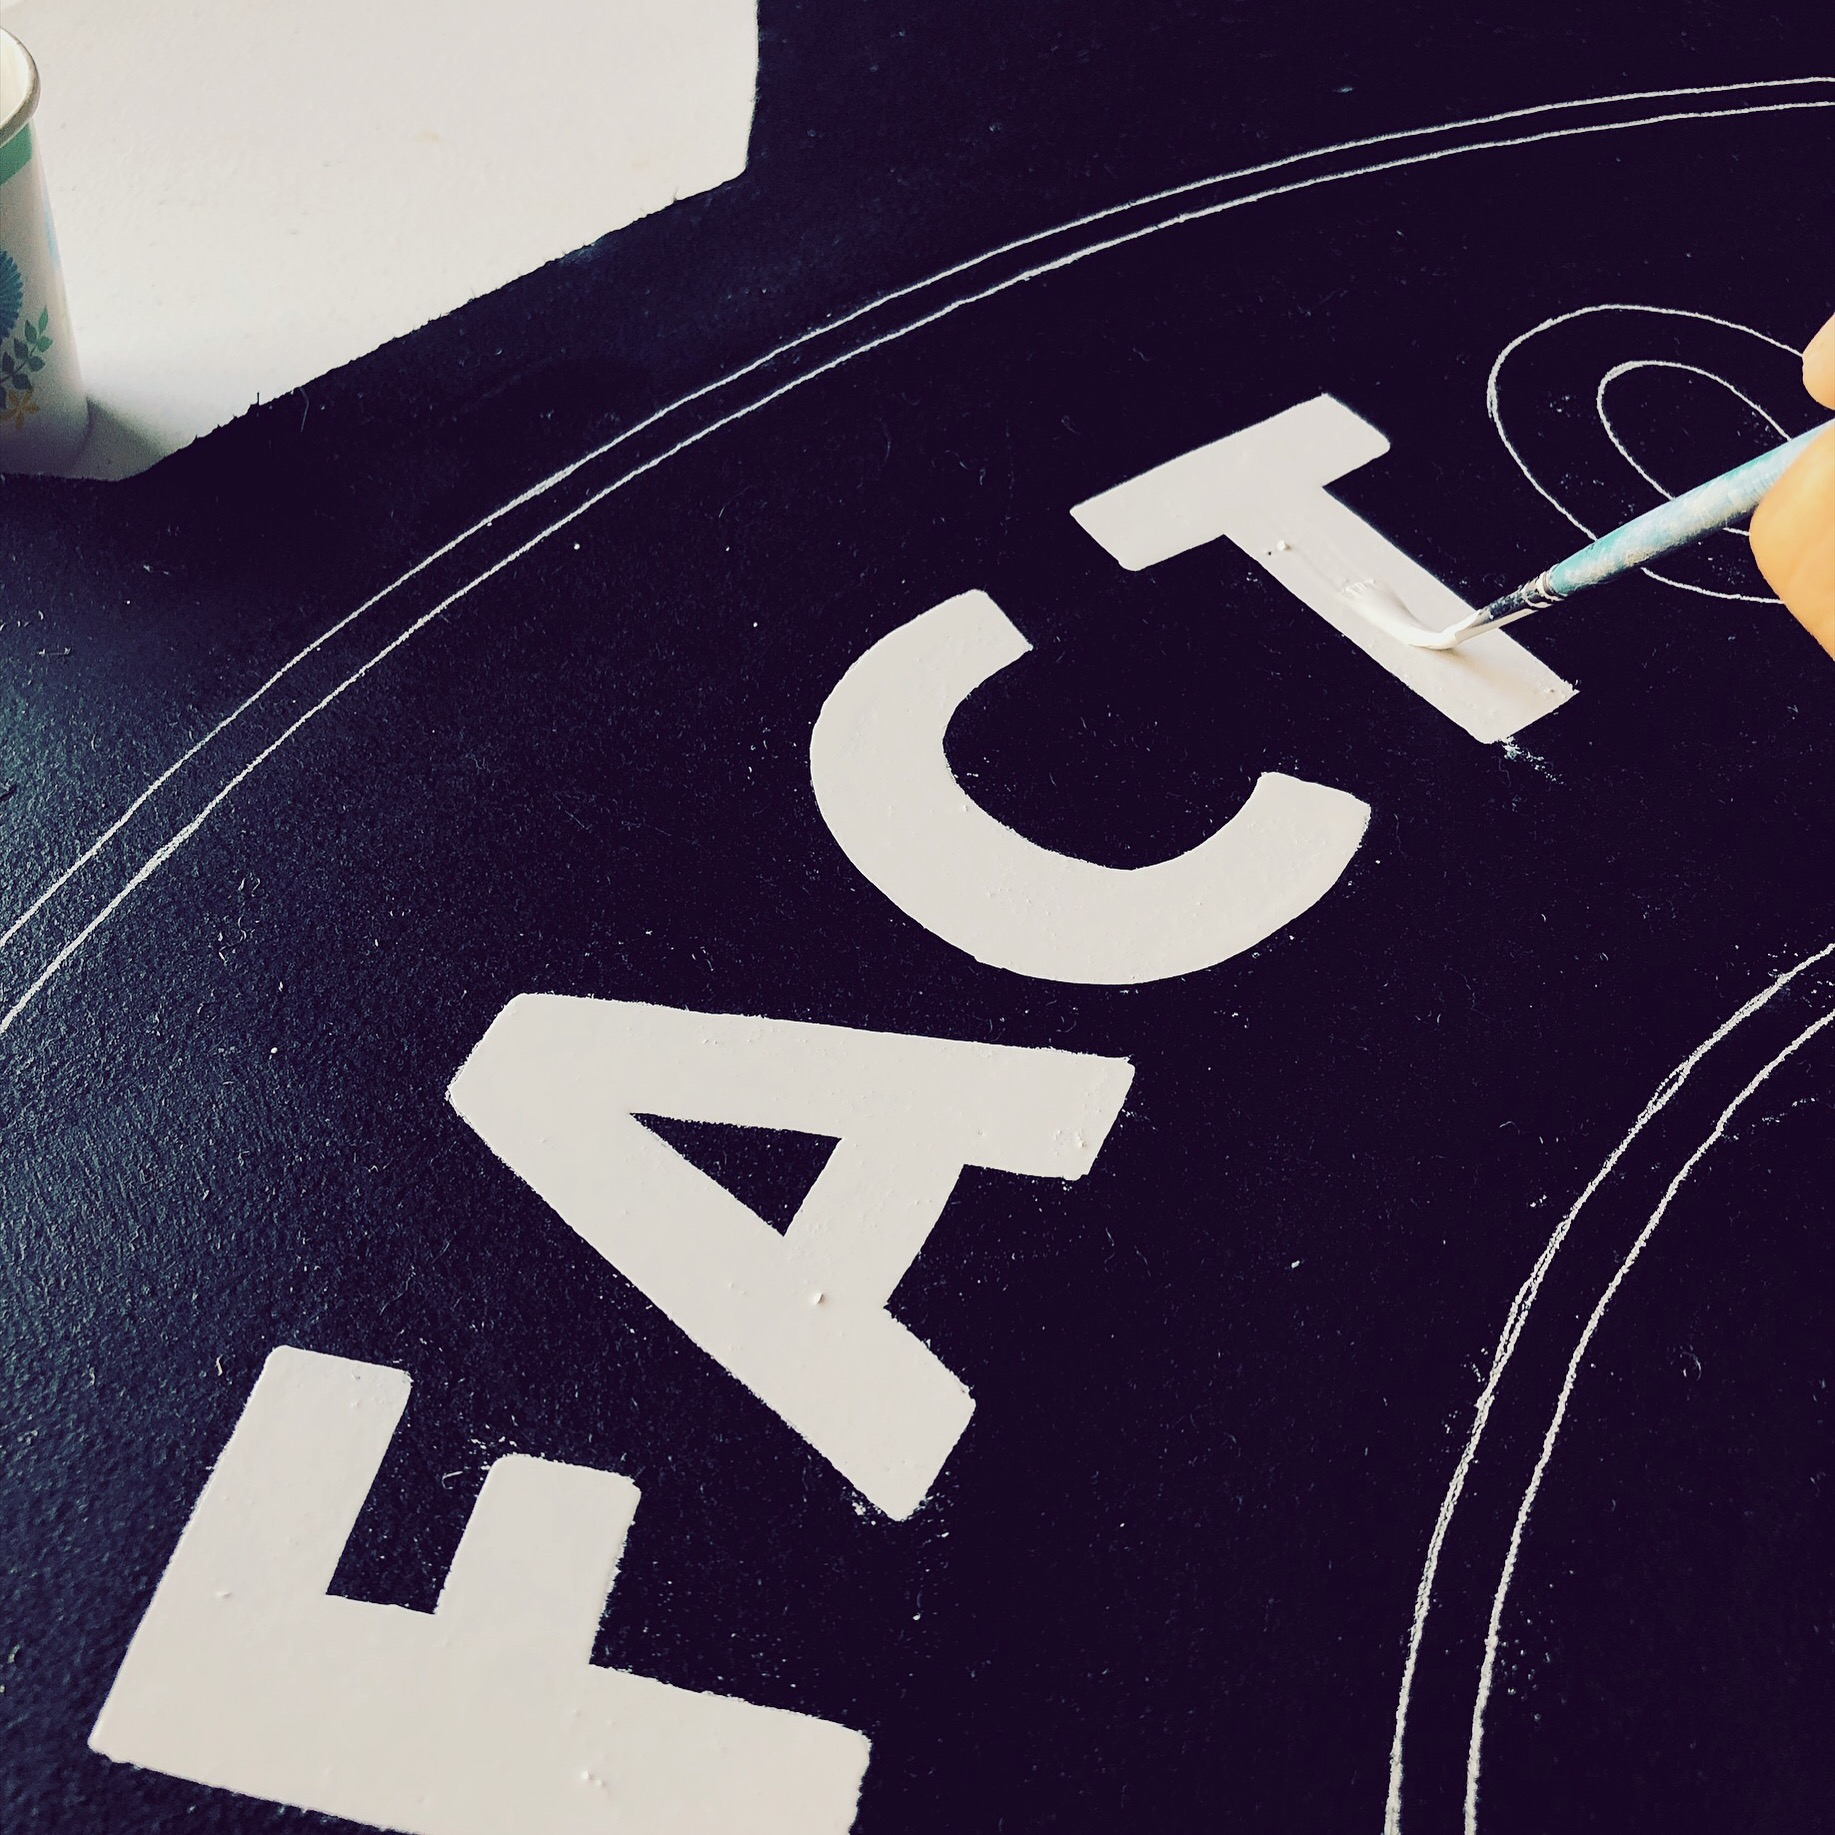 Leo-gomez-studio-hand-painted-sign-mini-doughnut-01